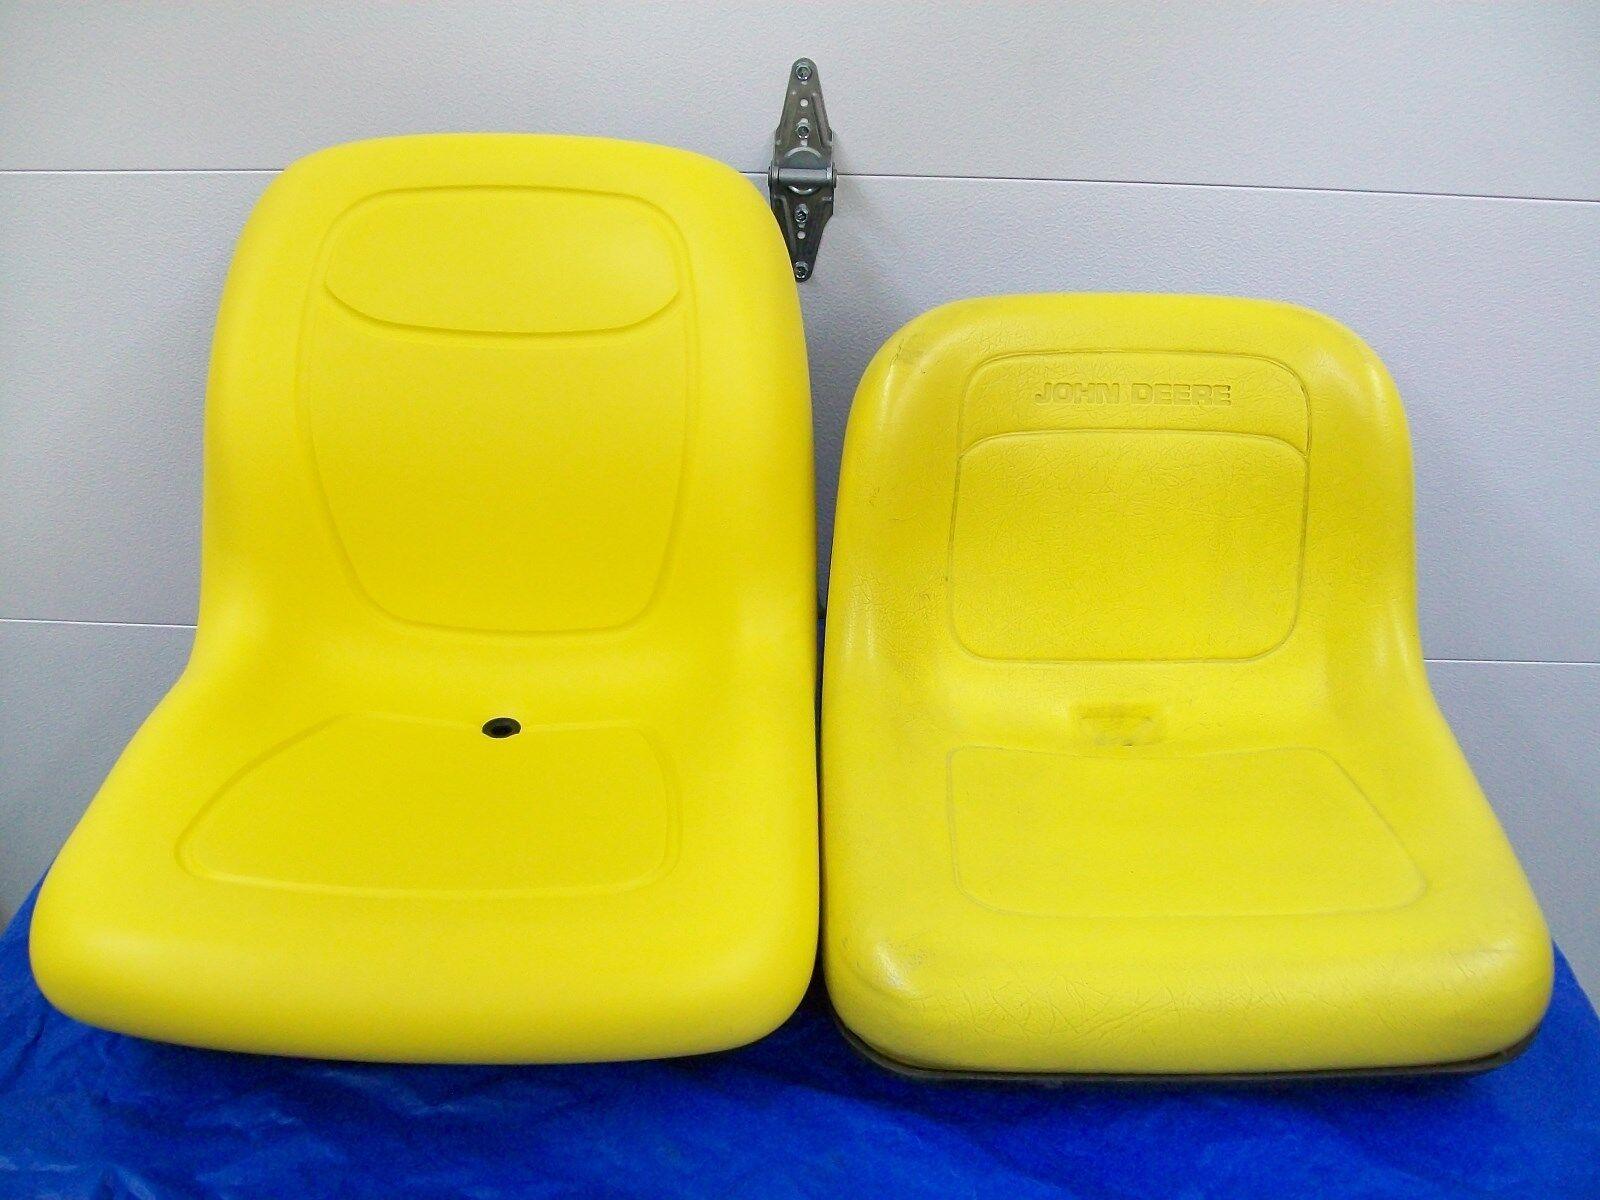 HIGH BACK SEAT JOHN DEERE GT225,GT235,GT245,GX325,GX335,GX34